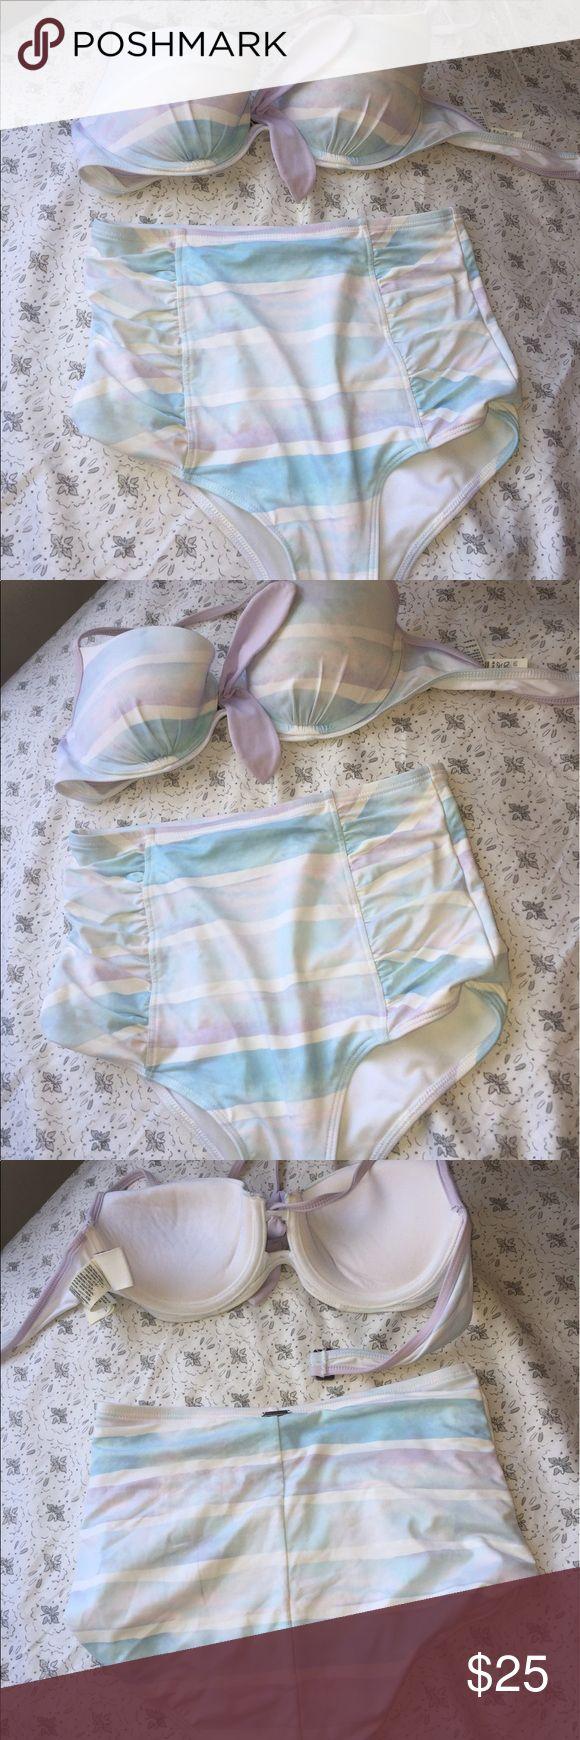 High waisted xs pastel bikini with push-up top Pastel blue and purple high waisted bikini with push up top Abercrombie & Fitch Swim Bikinis